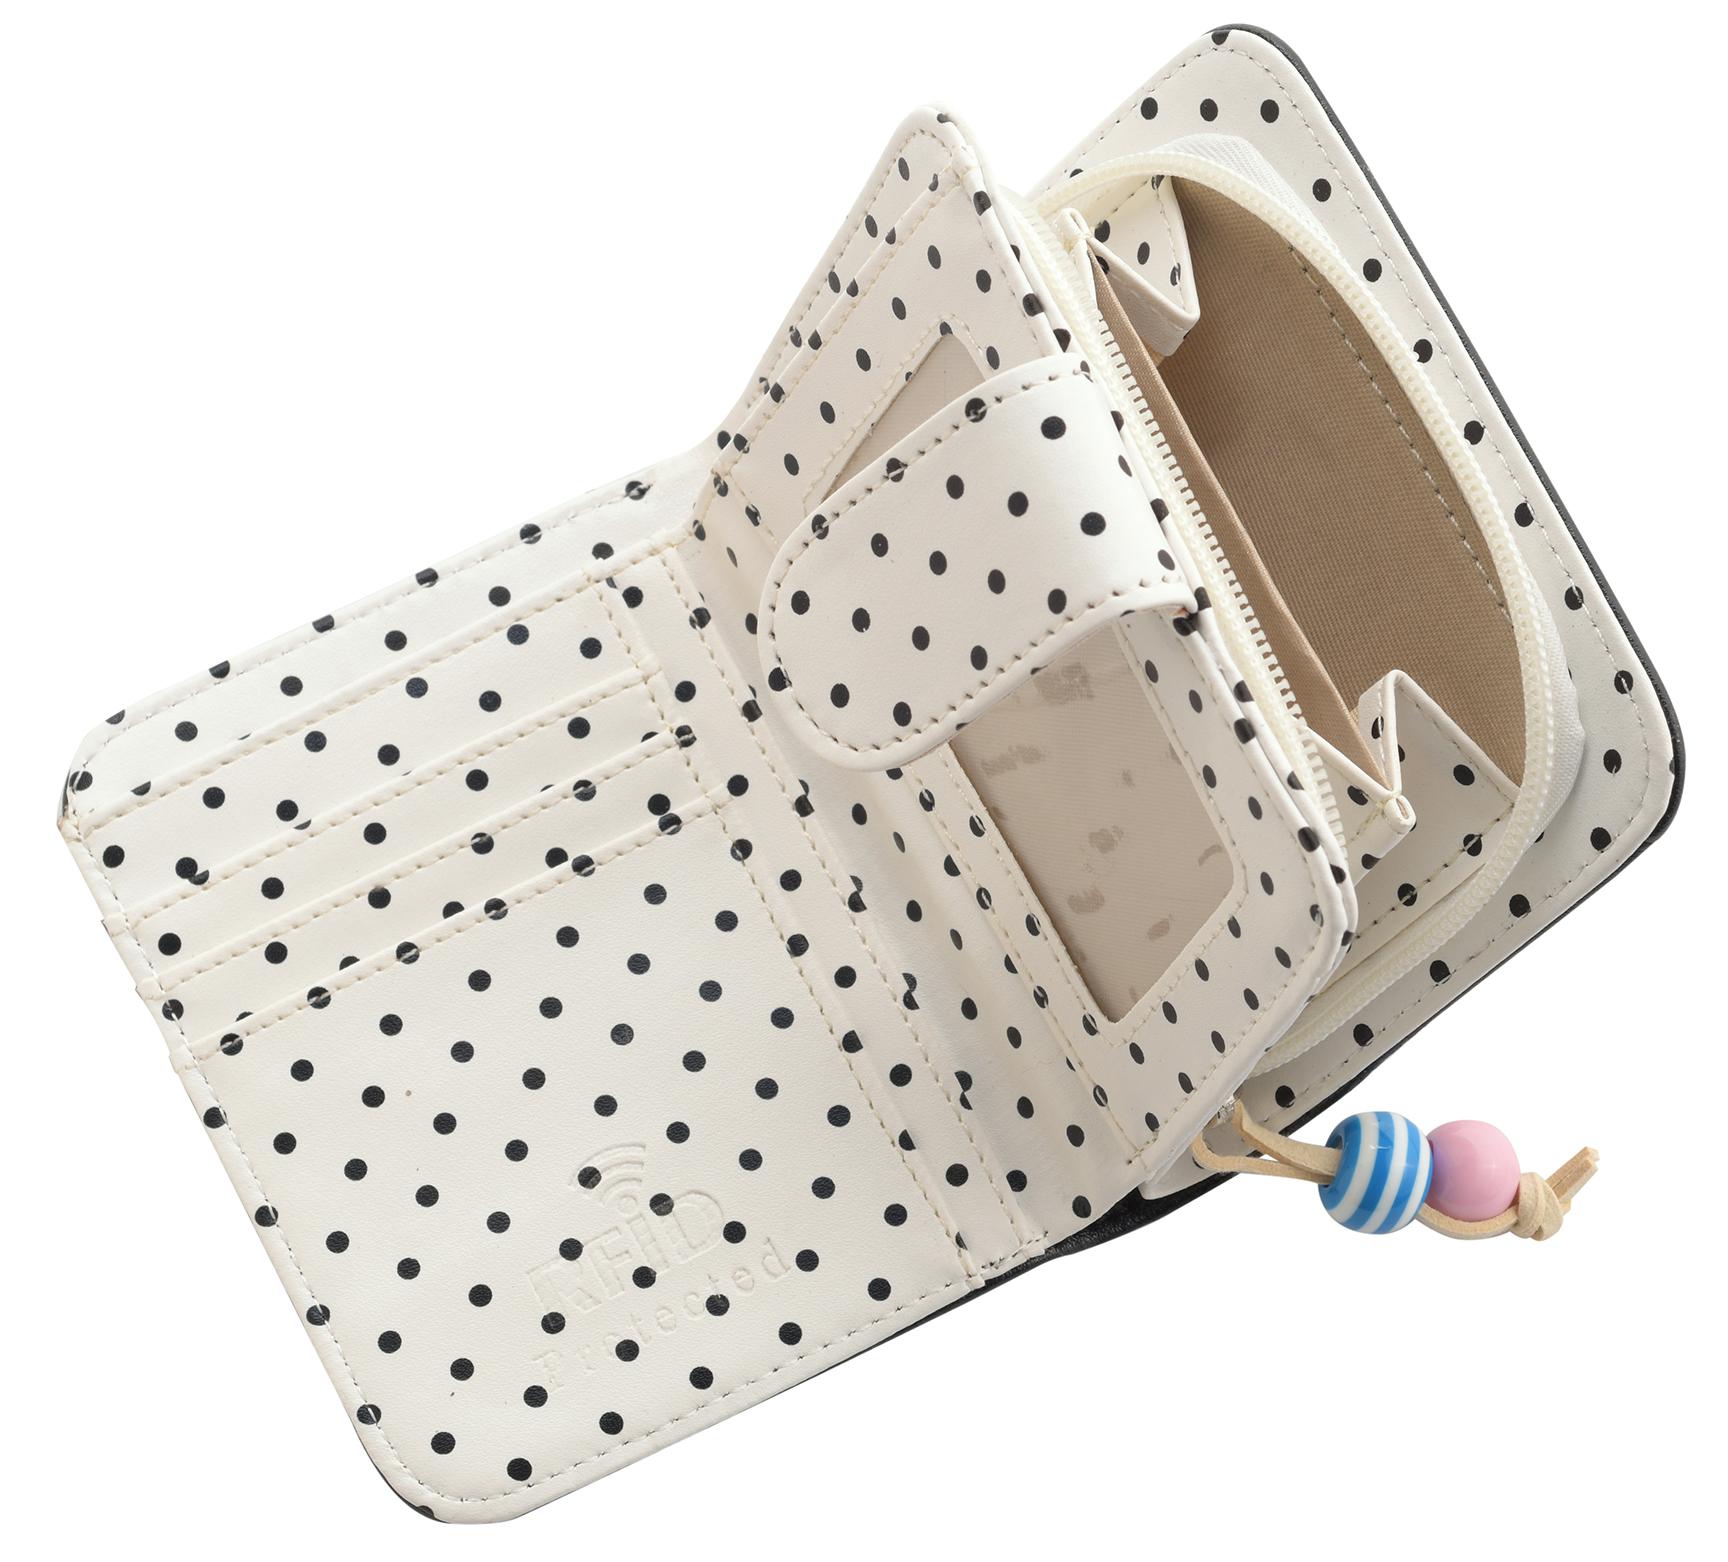 Mesdames-RFID-Bloquant-Petites-En-Faux-Cuir-Polka-Dot-Sac-zippee miniature 3